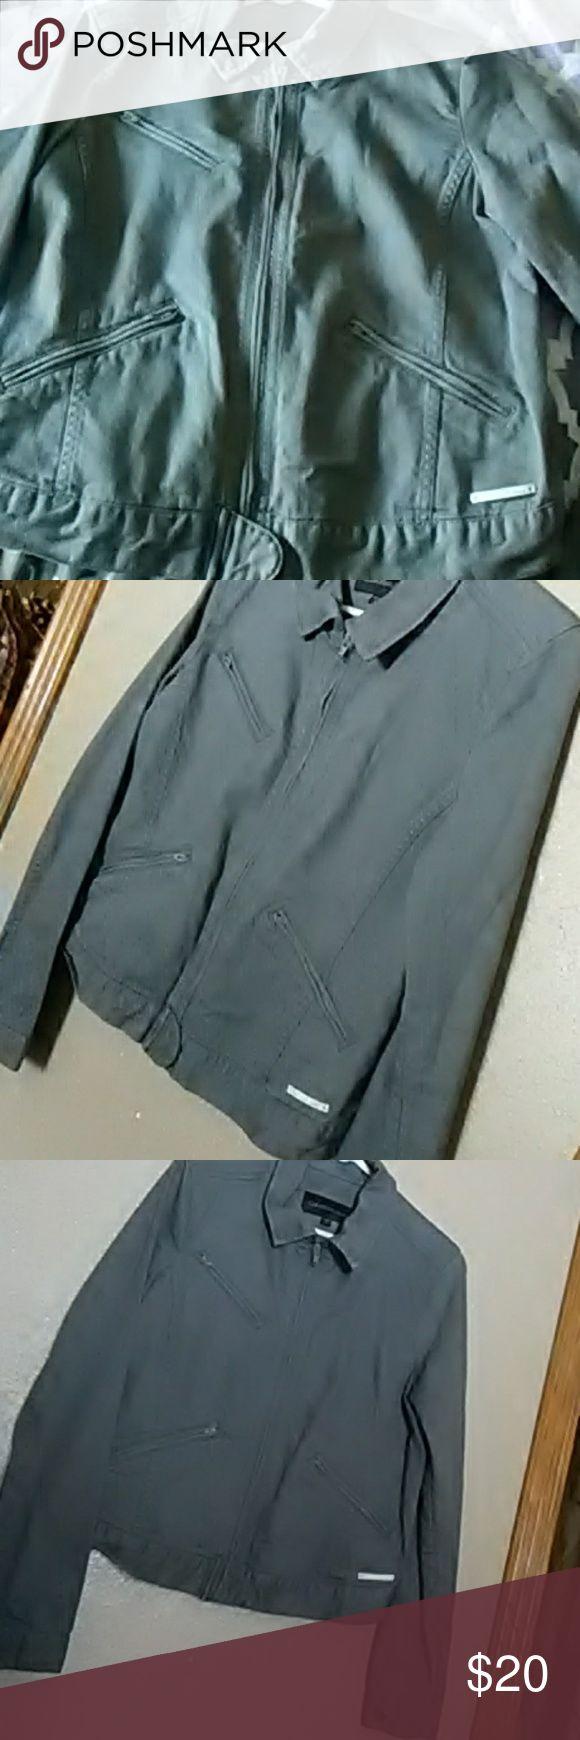 Calvin klein jean jacket Gray  Calvin Klein  Jean jacket Moto style Size medium Must have in ur closet Trade value $30 Calvin Klein Jackets & Coats Jean Jackets